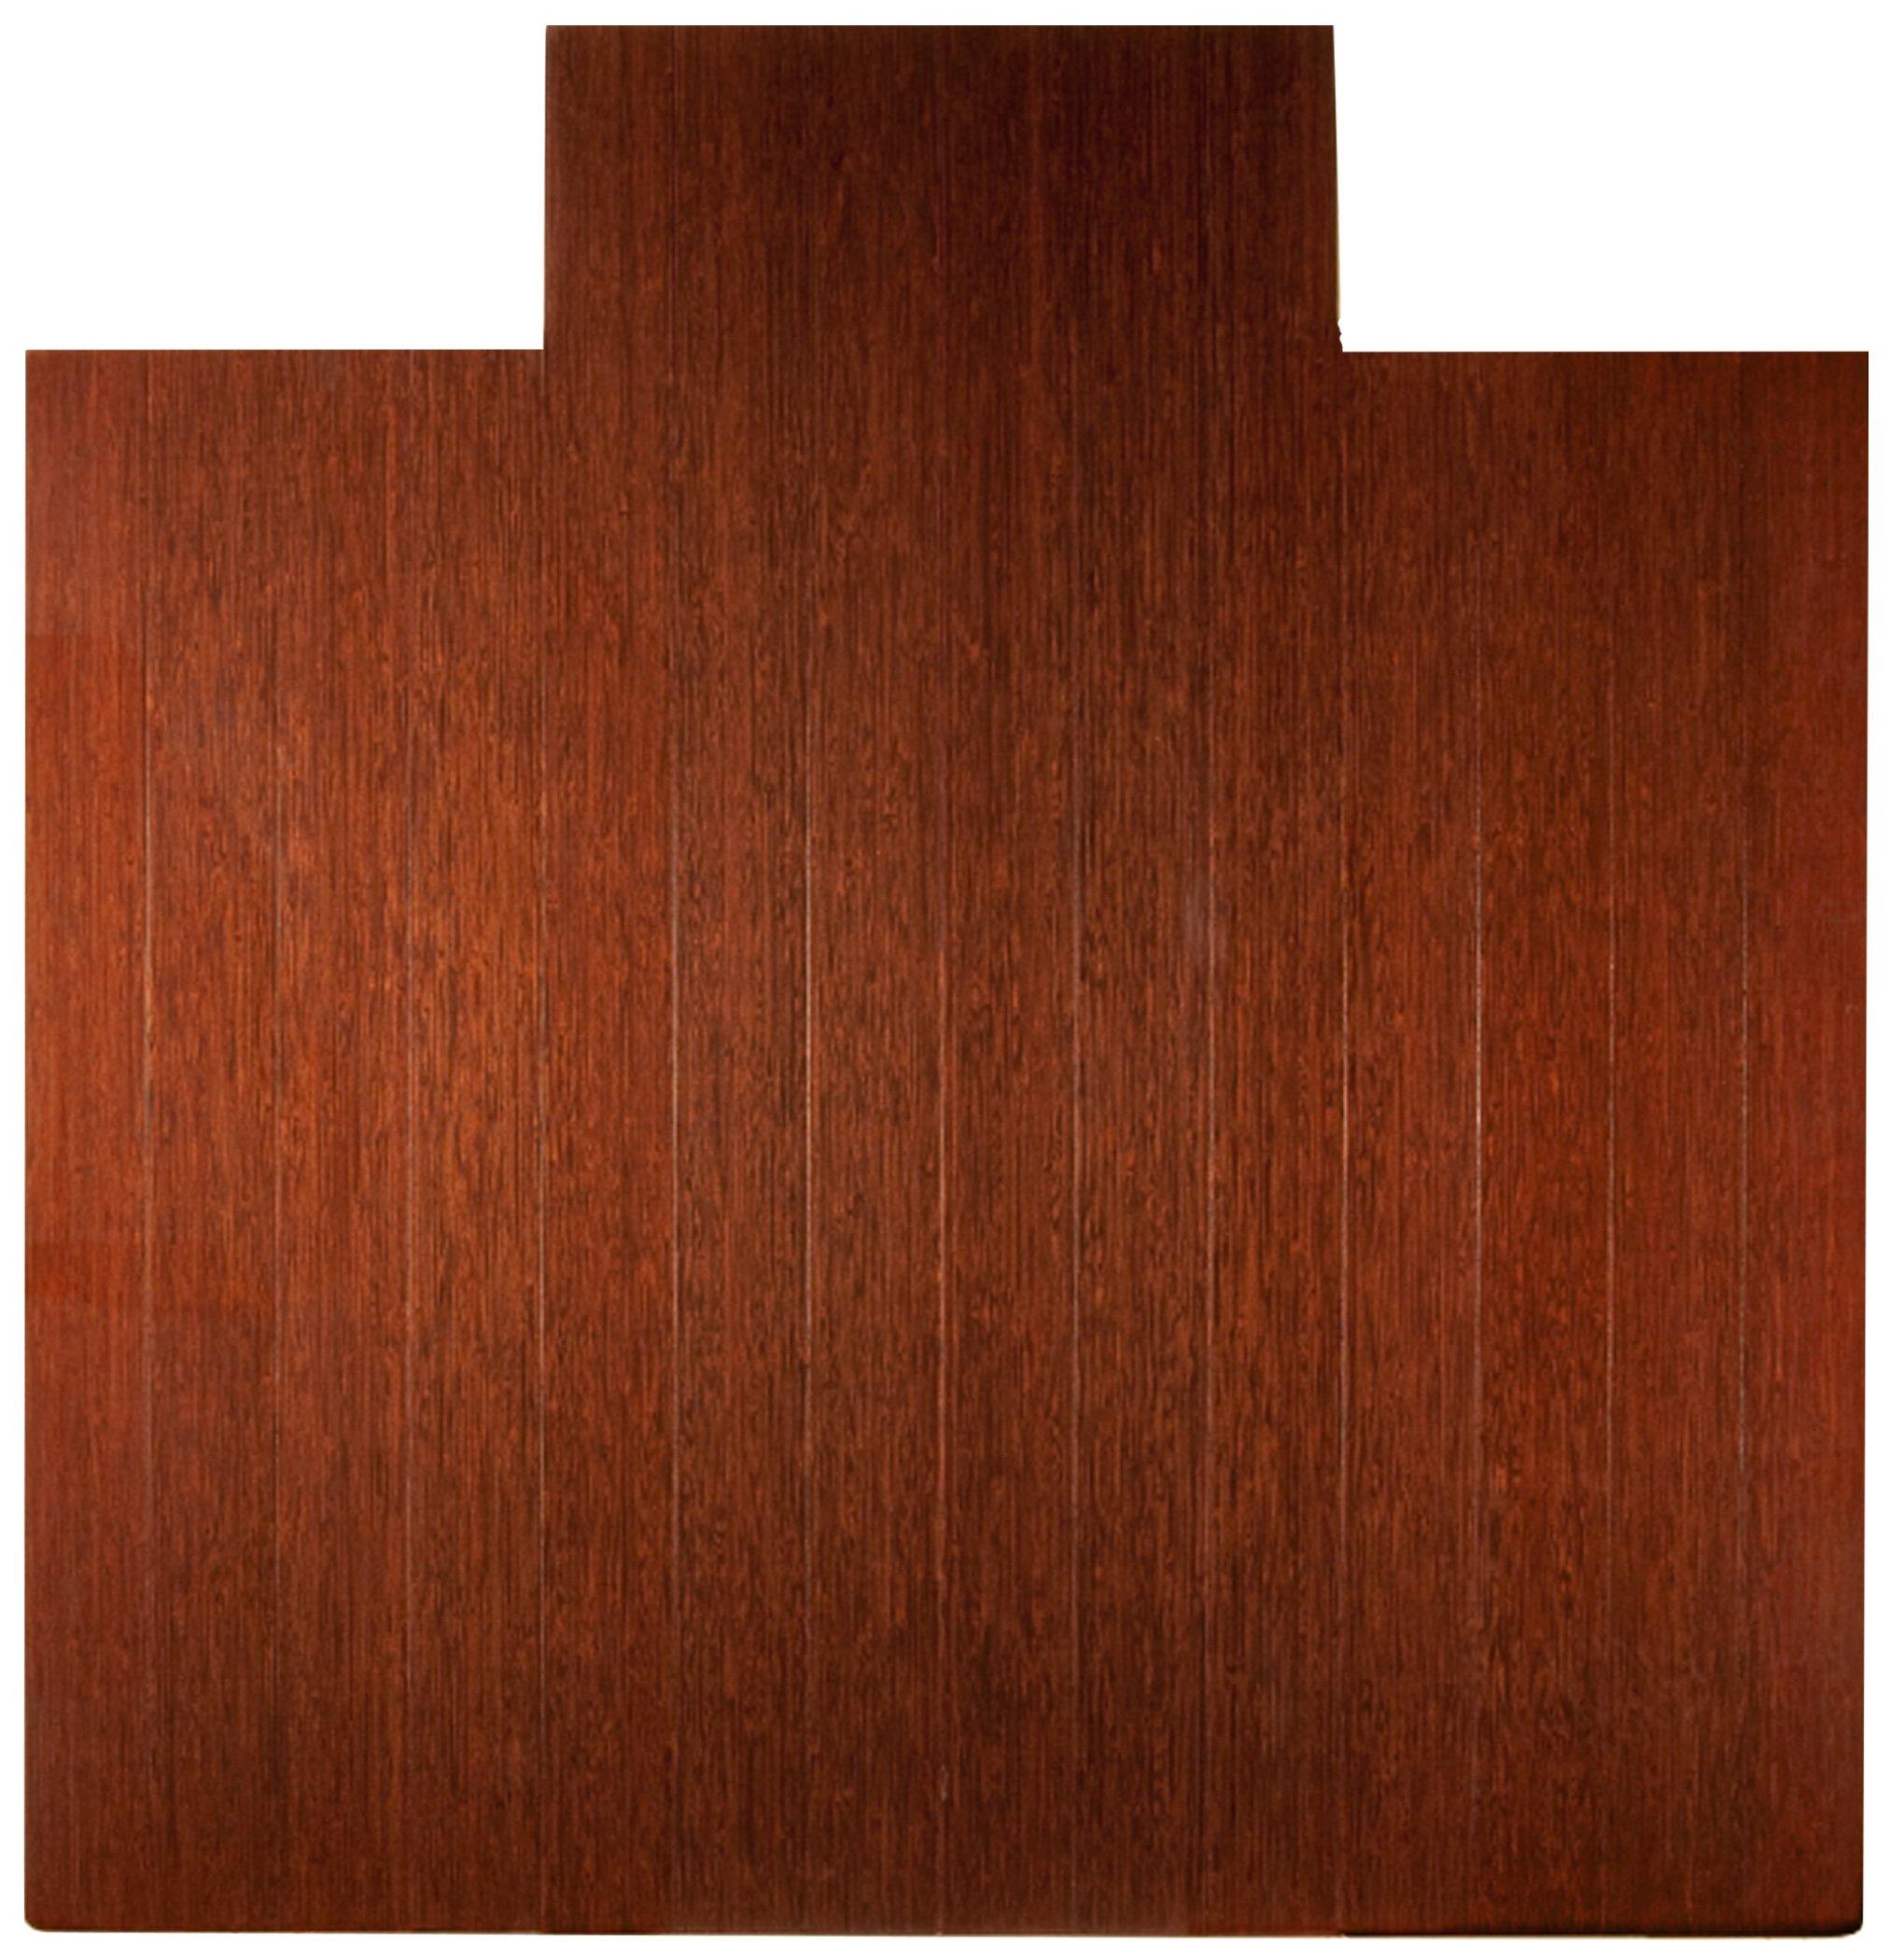 Anji Mountain AMB24025W Real Bamboo Wood Chair Mat, 55 x 57, Dark Cherry